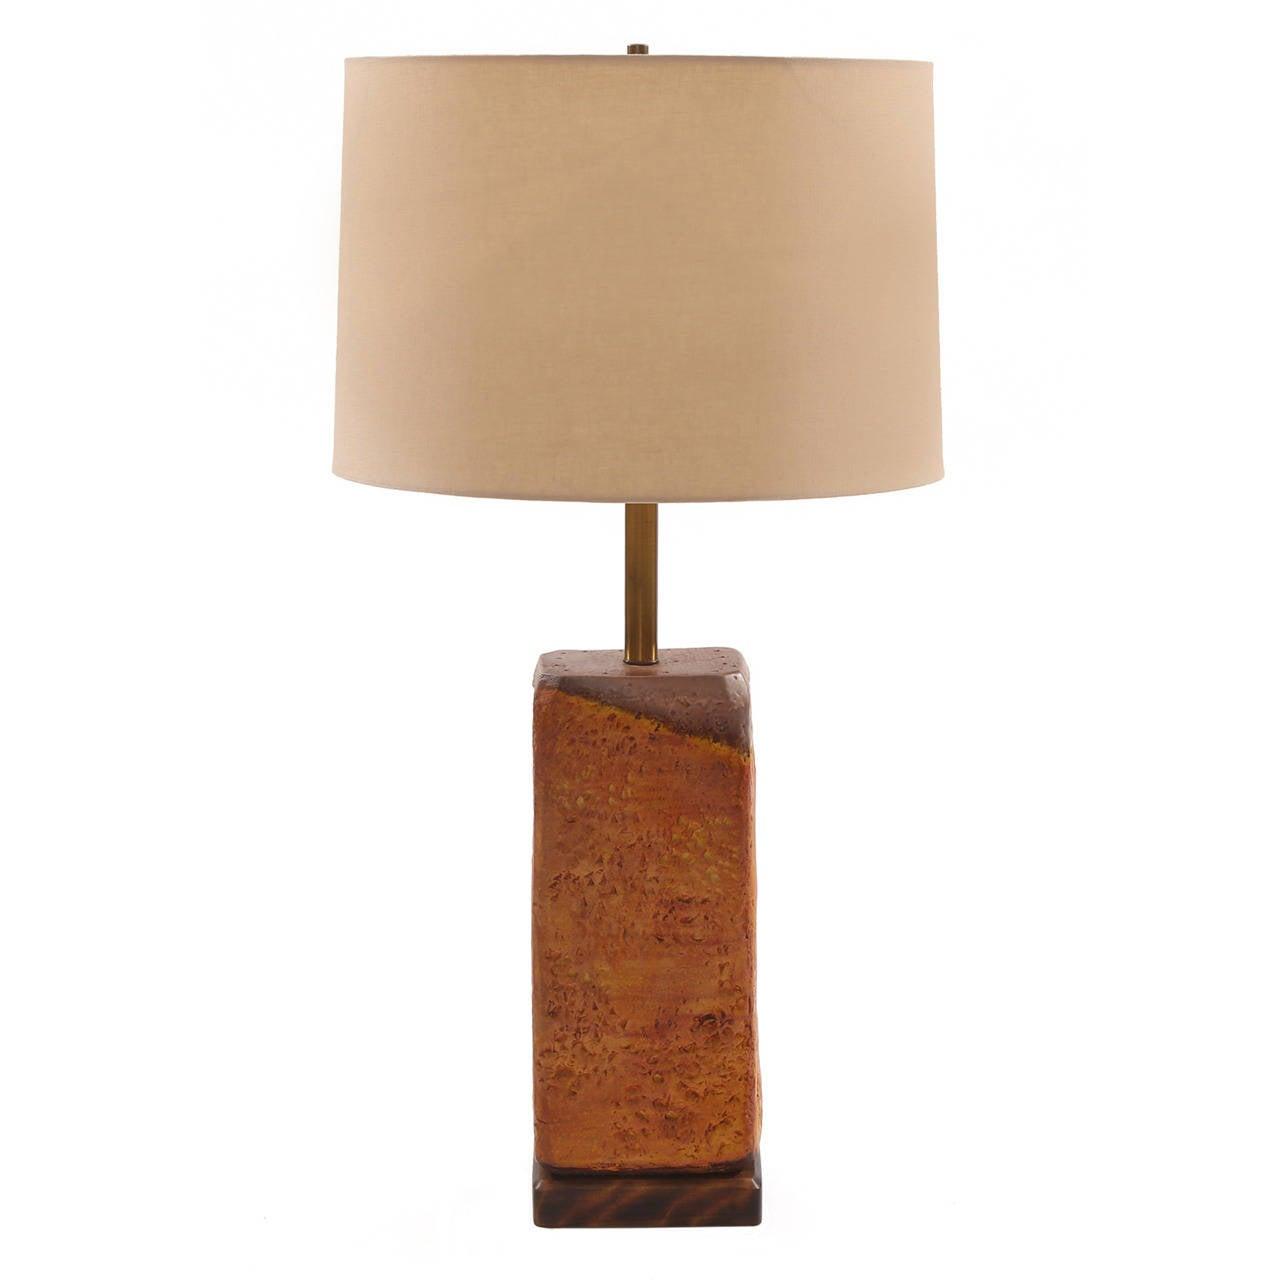 Marcello Fantoni for Raymor Ceramic Lamp